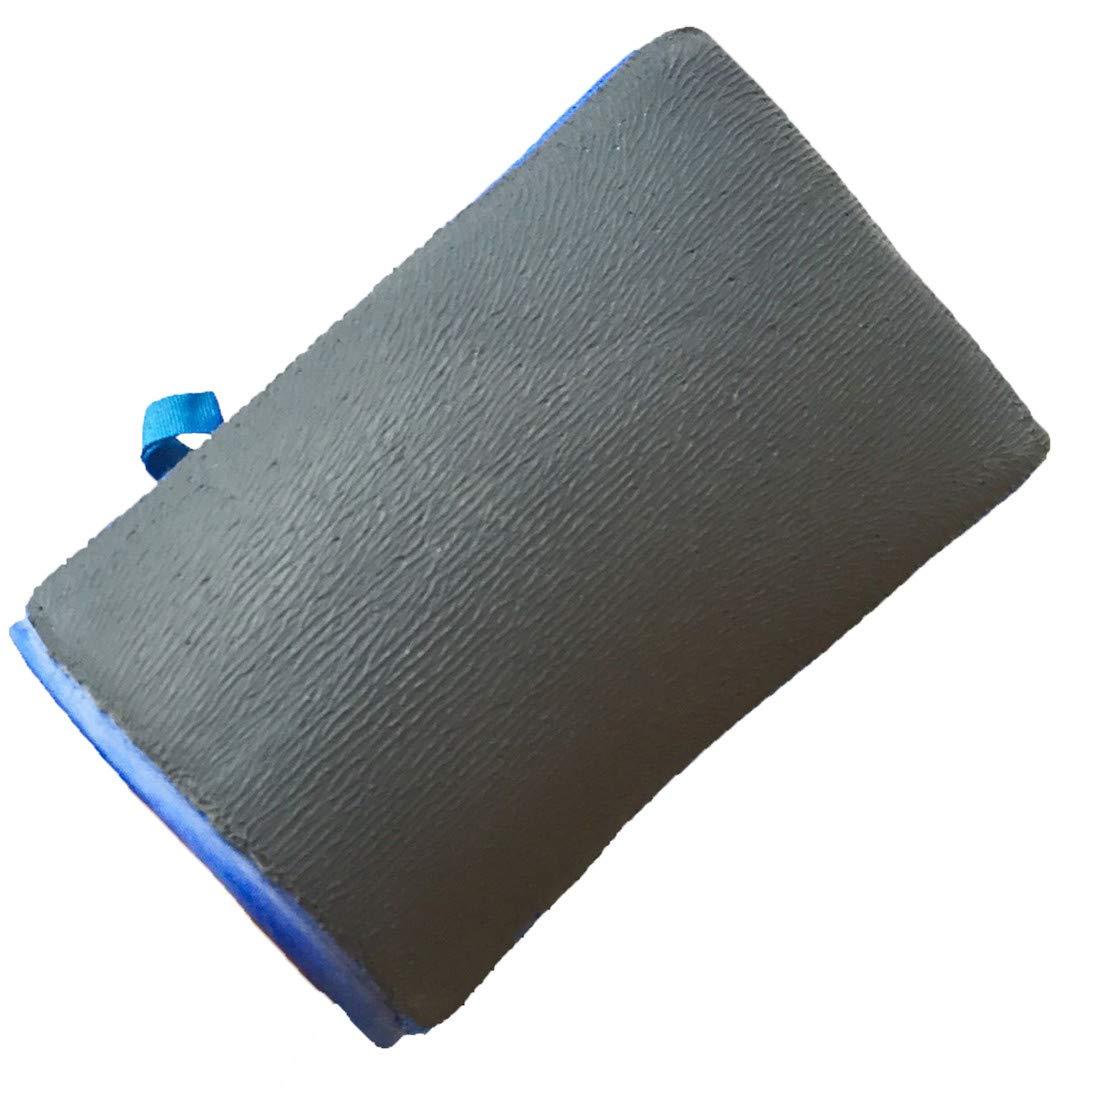 Jundi Clay Mitt, Fine Grade Detailing Clay Bar Mitt Vehicle Surface Prep Mitt Finish Clay Glove Car Care Clay Eraser Mitt Detailing Tool(1 Piece)